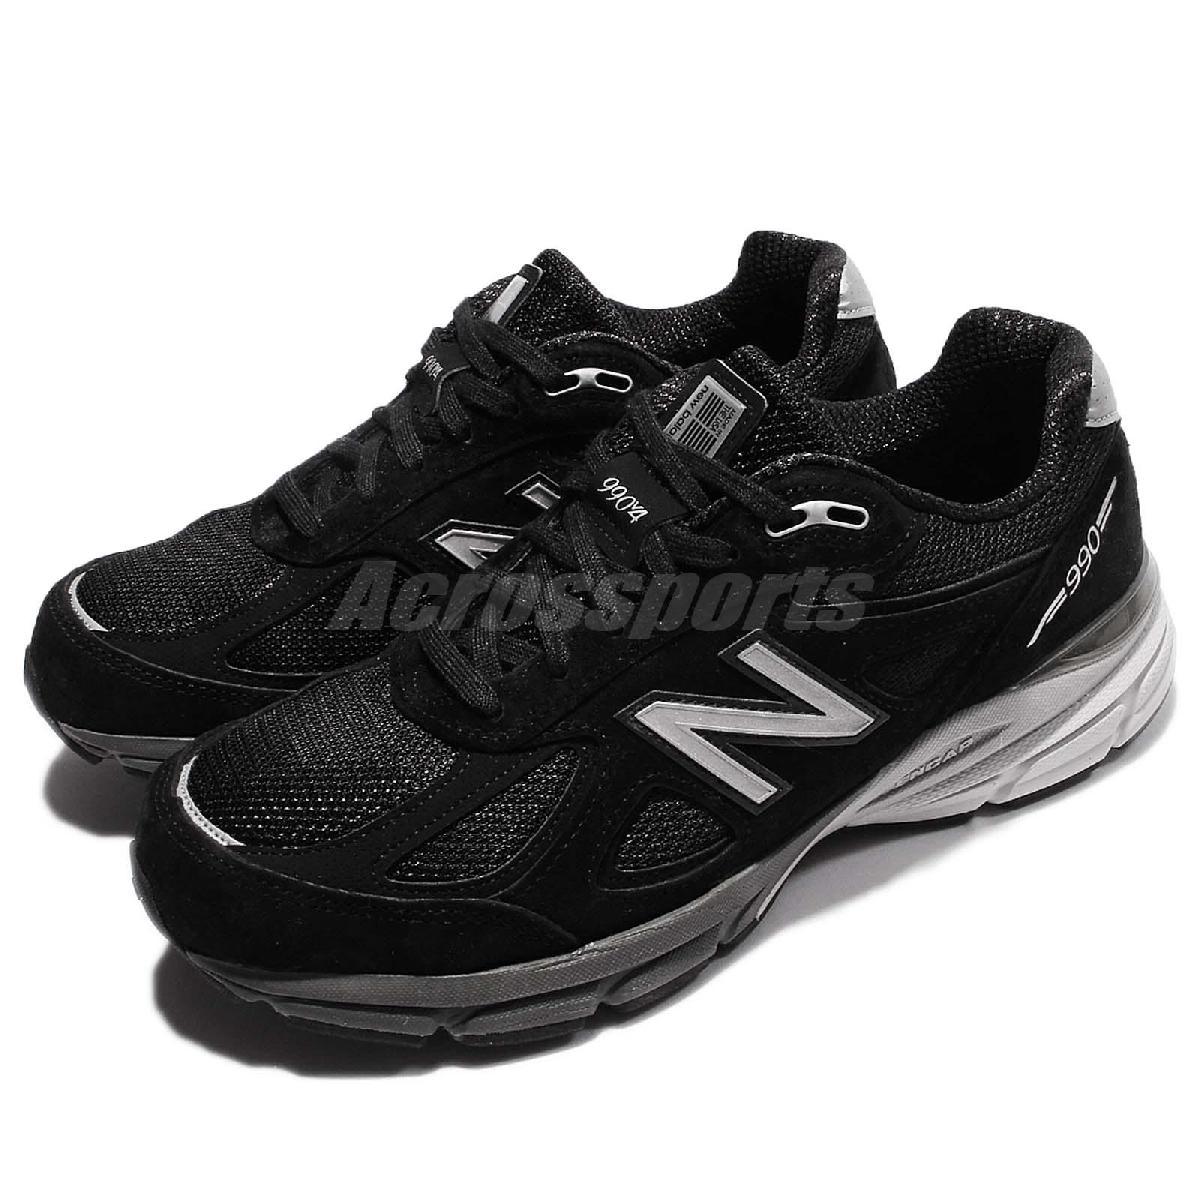 New Balance 慢跑鞋 990 NB 黑 灰 麂皮 寬楦 美國製 運動鞋 男鞋【PUMP306】 M990BK42E